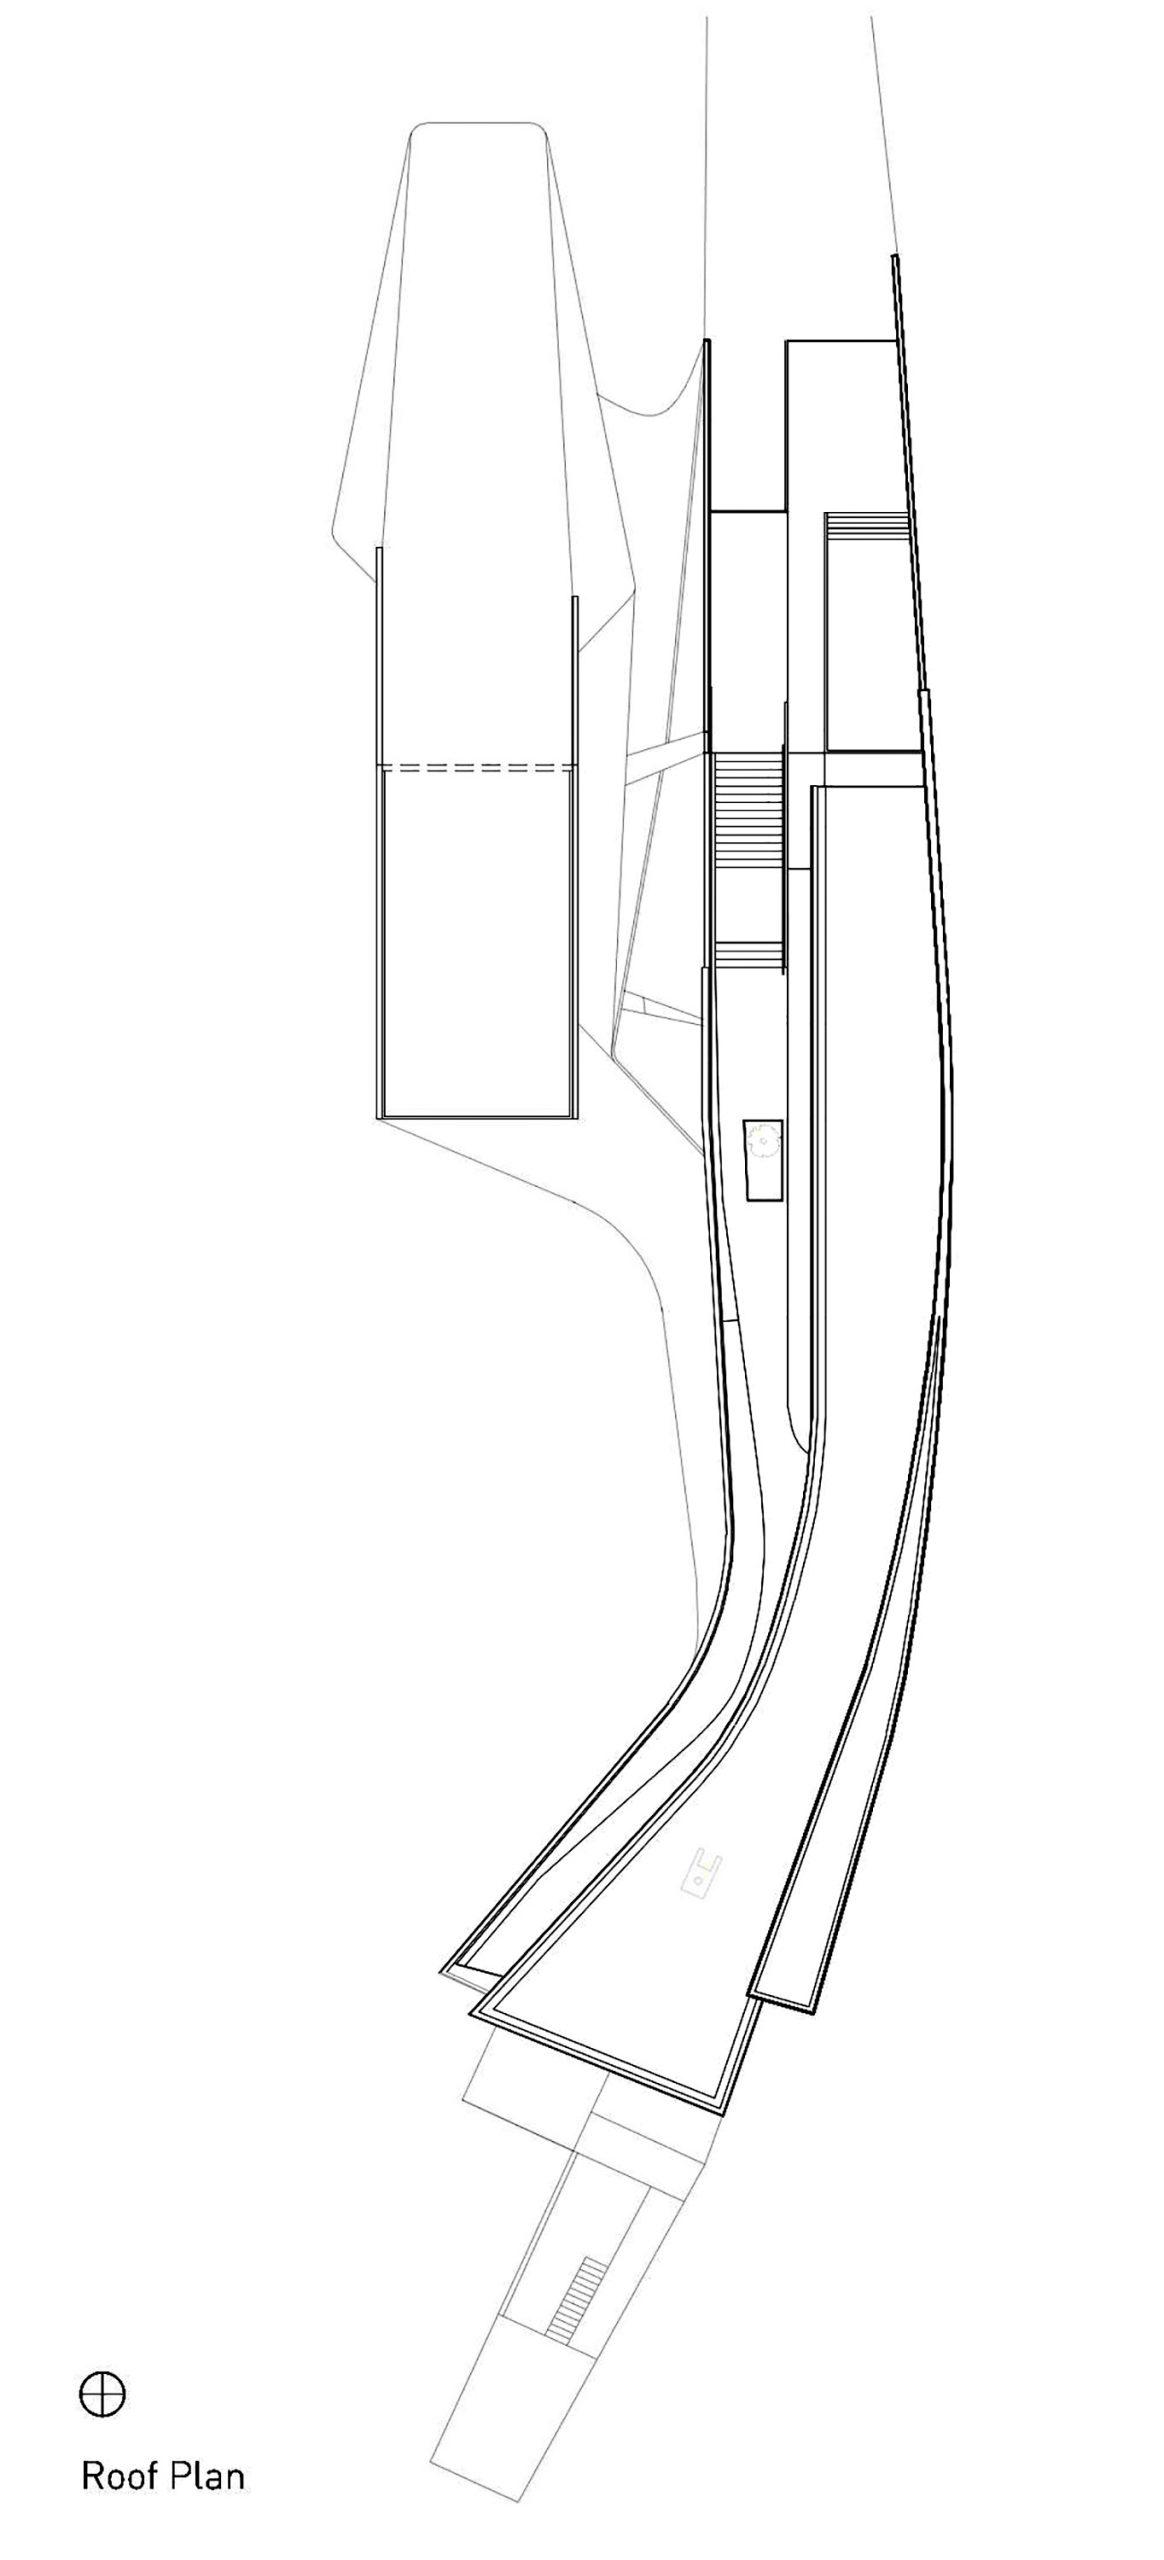 Roof Floor Plan – Port Hope Residence – Lakeshore Rd, Port Hope, ON, Canada